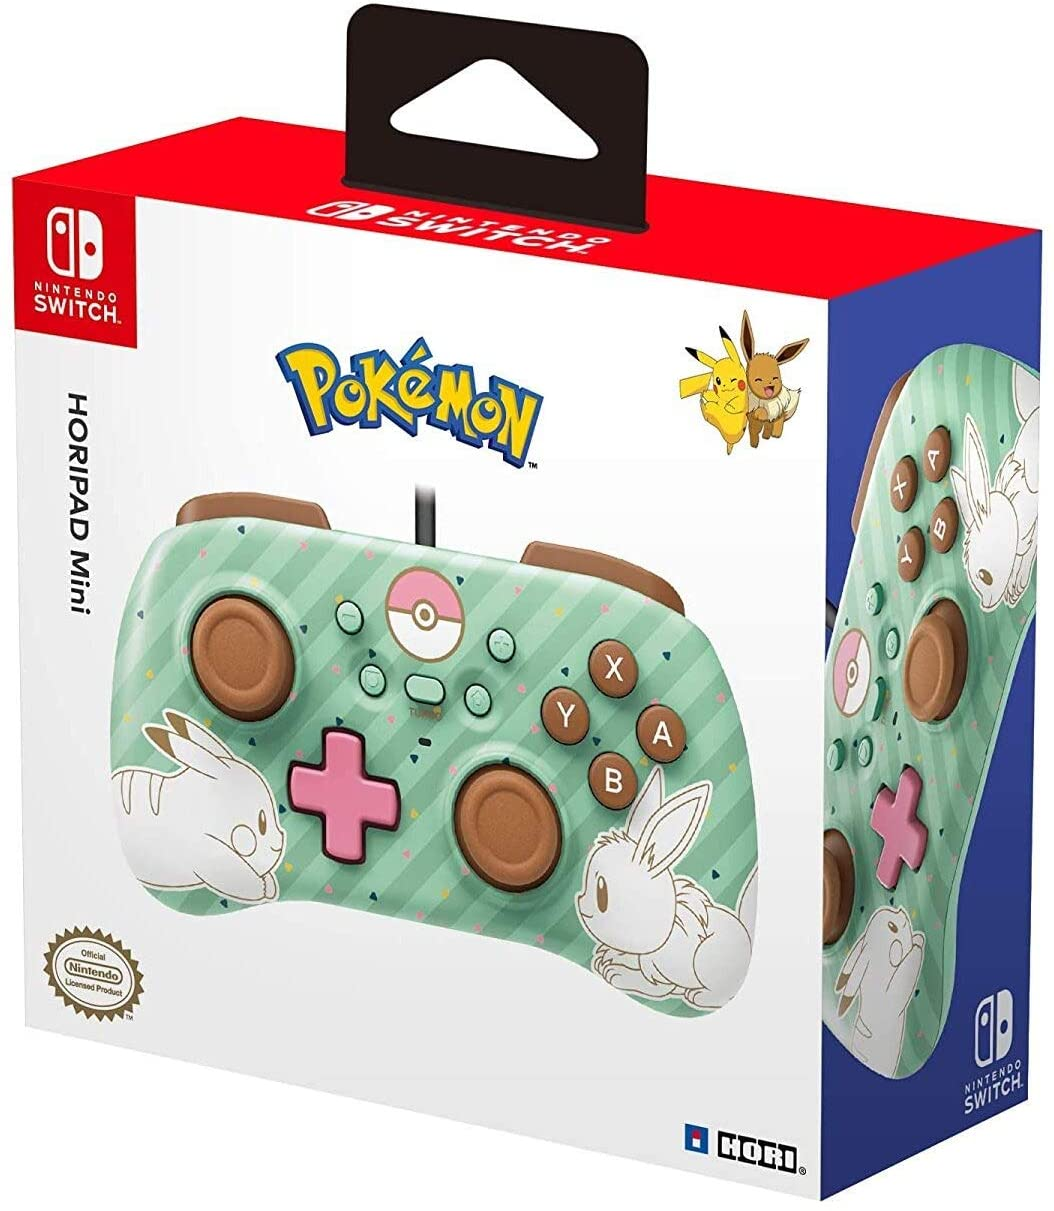 HORIPAD Mini (Pikachu & Eevee) for Nintendo Switch